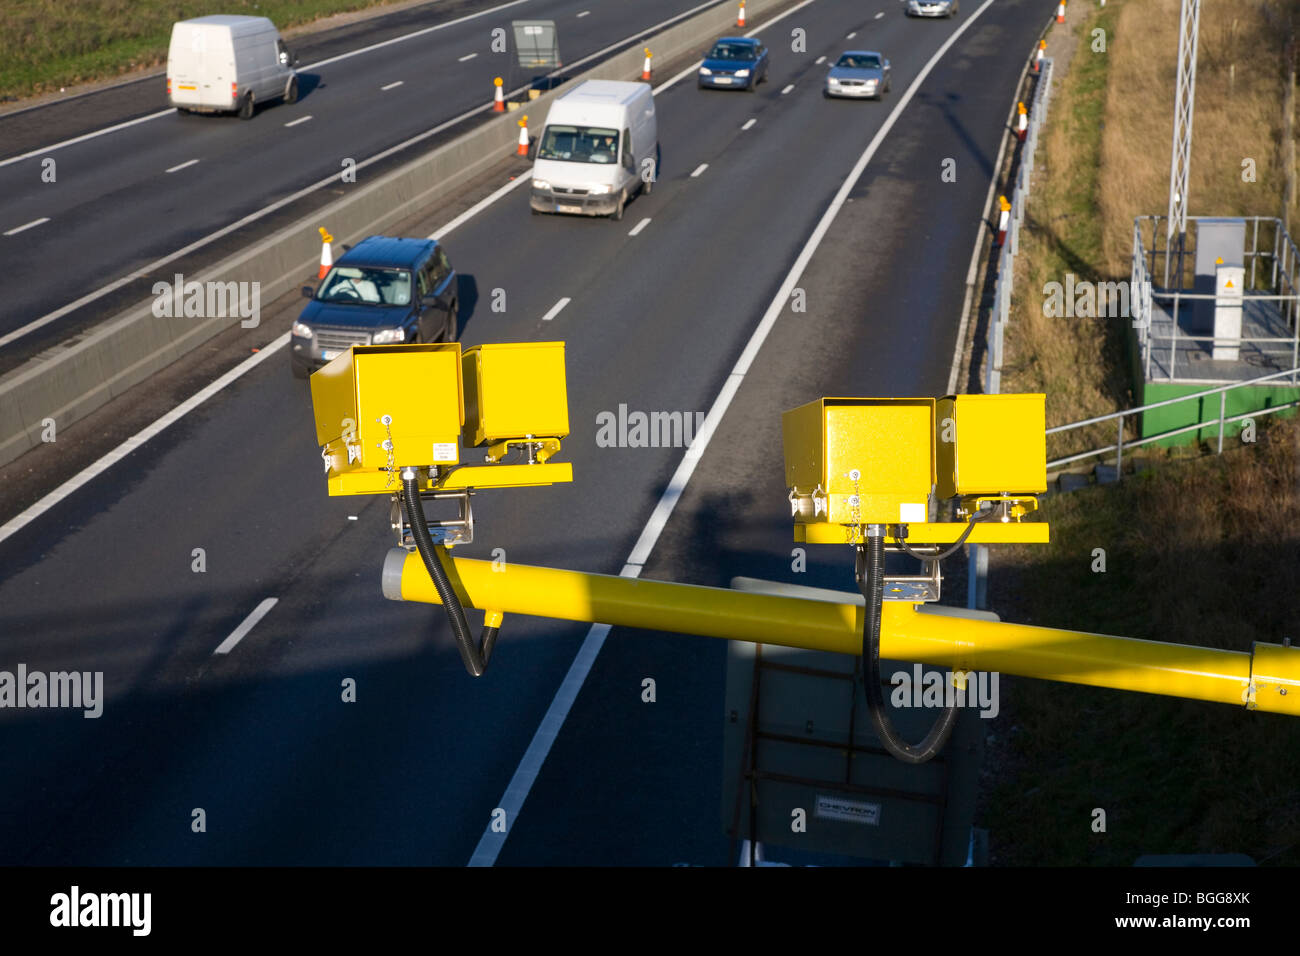 Average speed camera on the M11 motorway - Stock Image